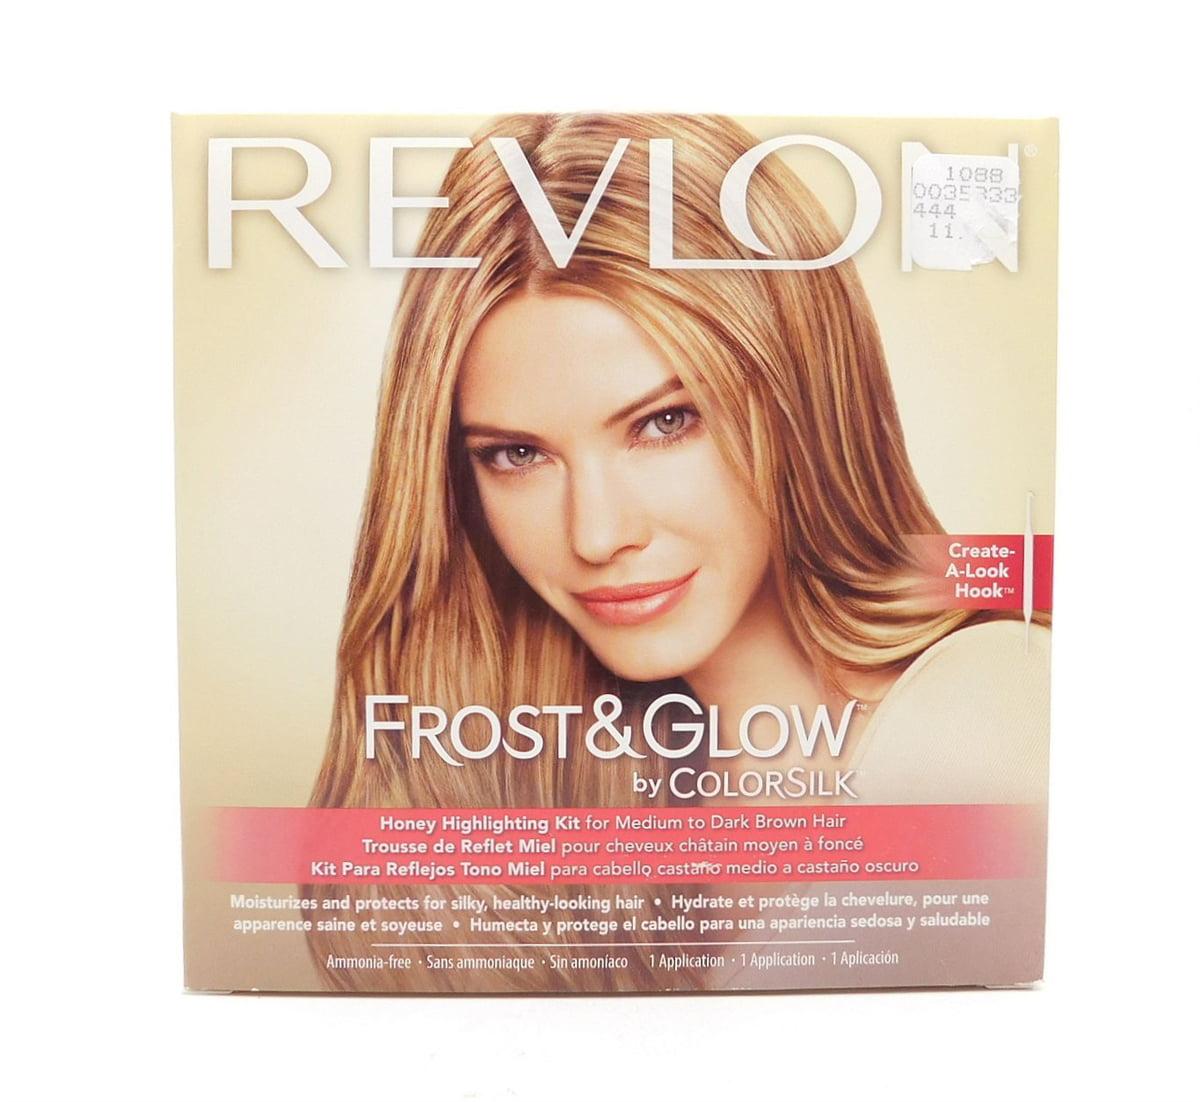 Revlon Frost & Glow by Colorsilk Honey Highlighting Kit for Medium to Dark Brown Hair 1 Application